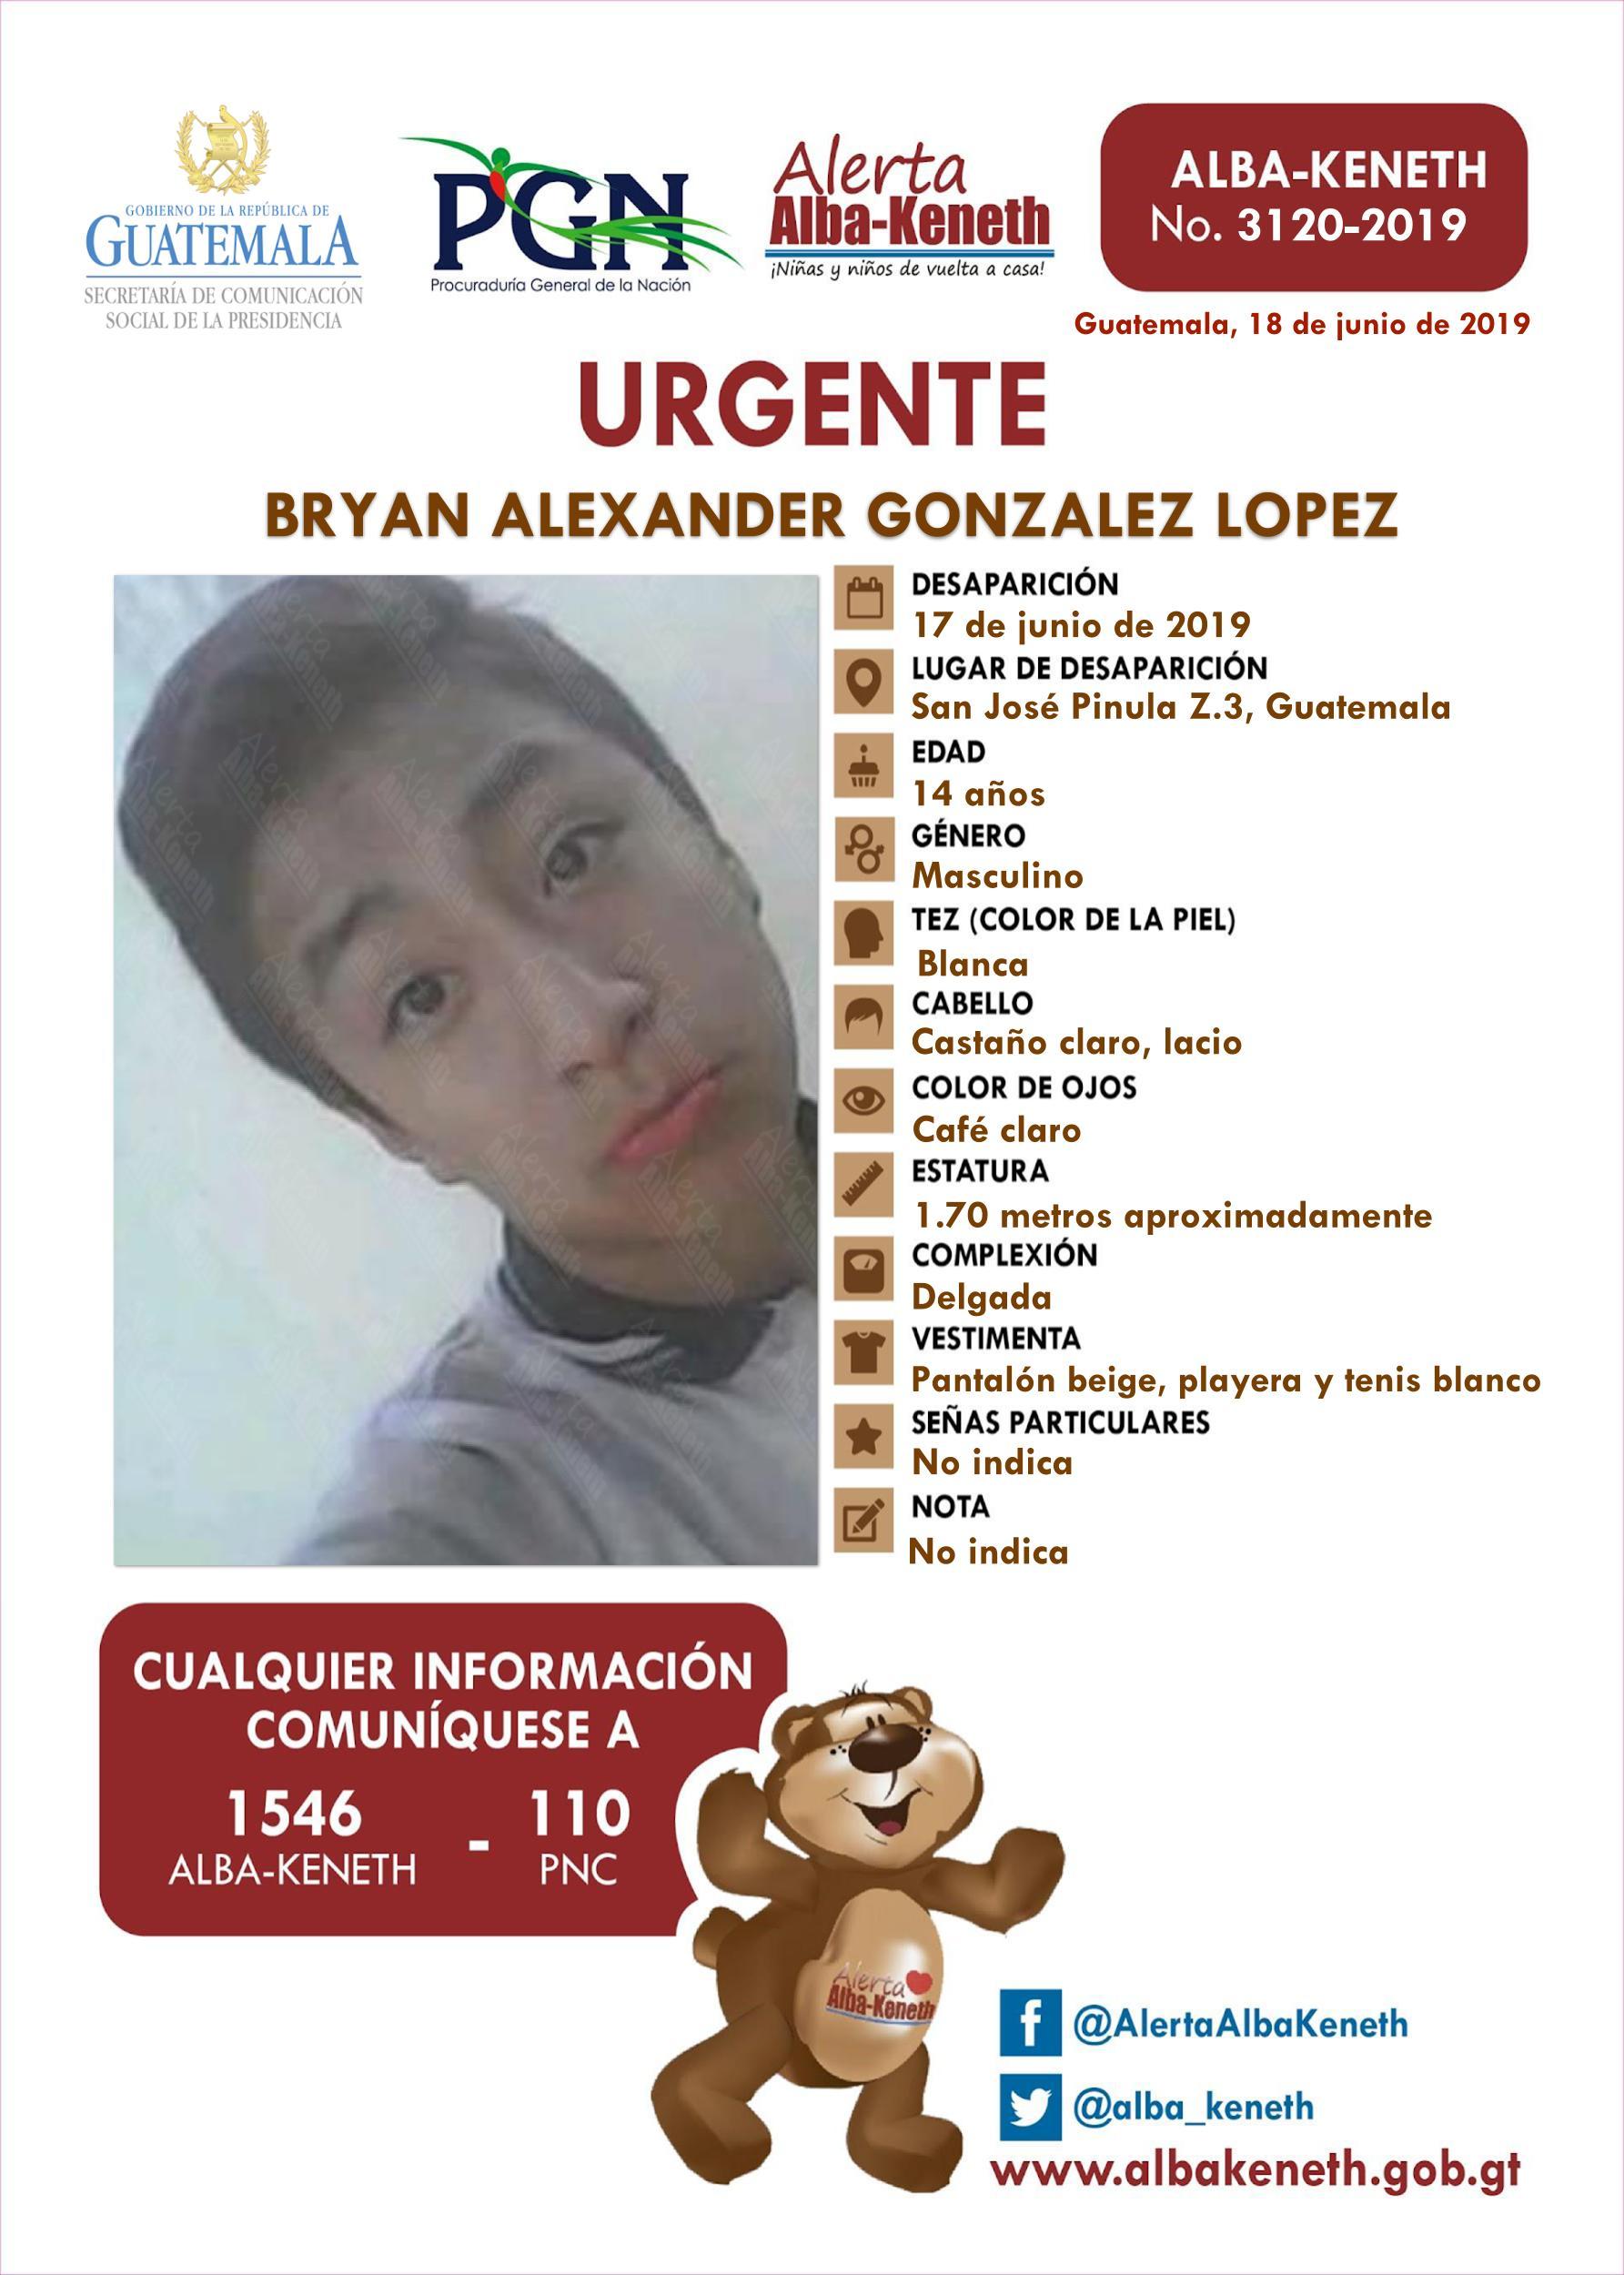 Bryan Alexander Gonzalez Lopez